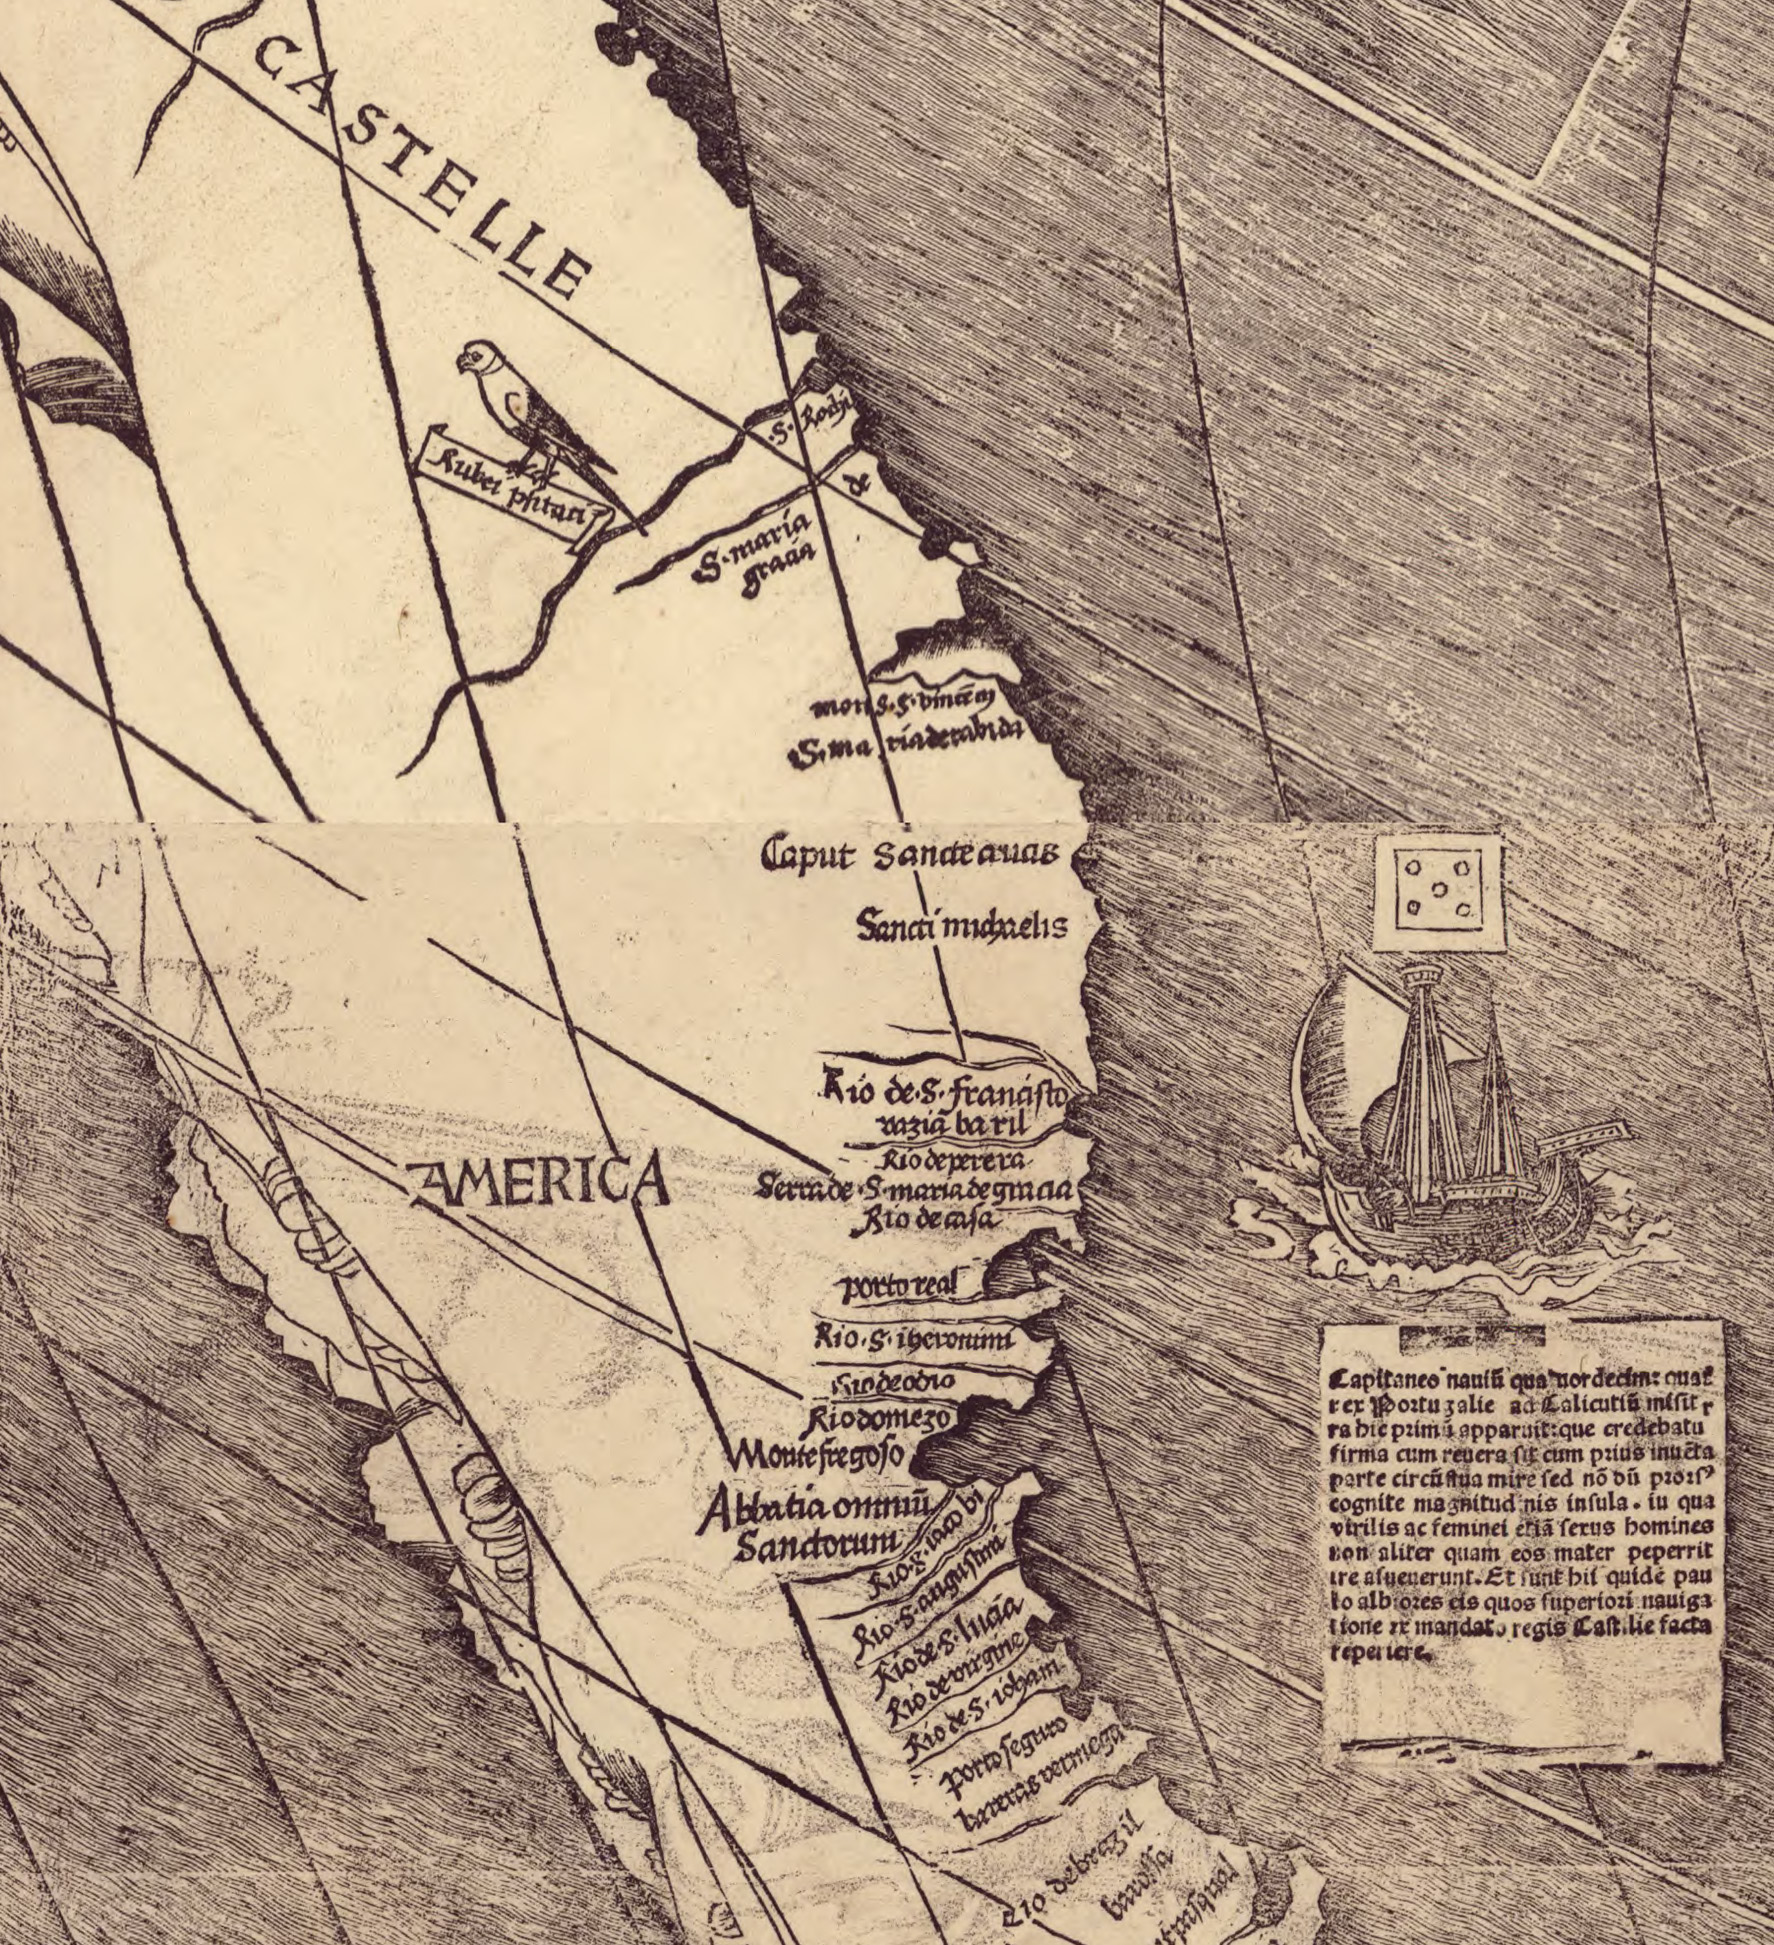 Waldseemuller Map 1507 Full Size